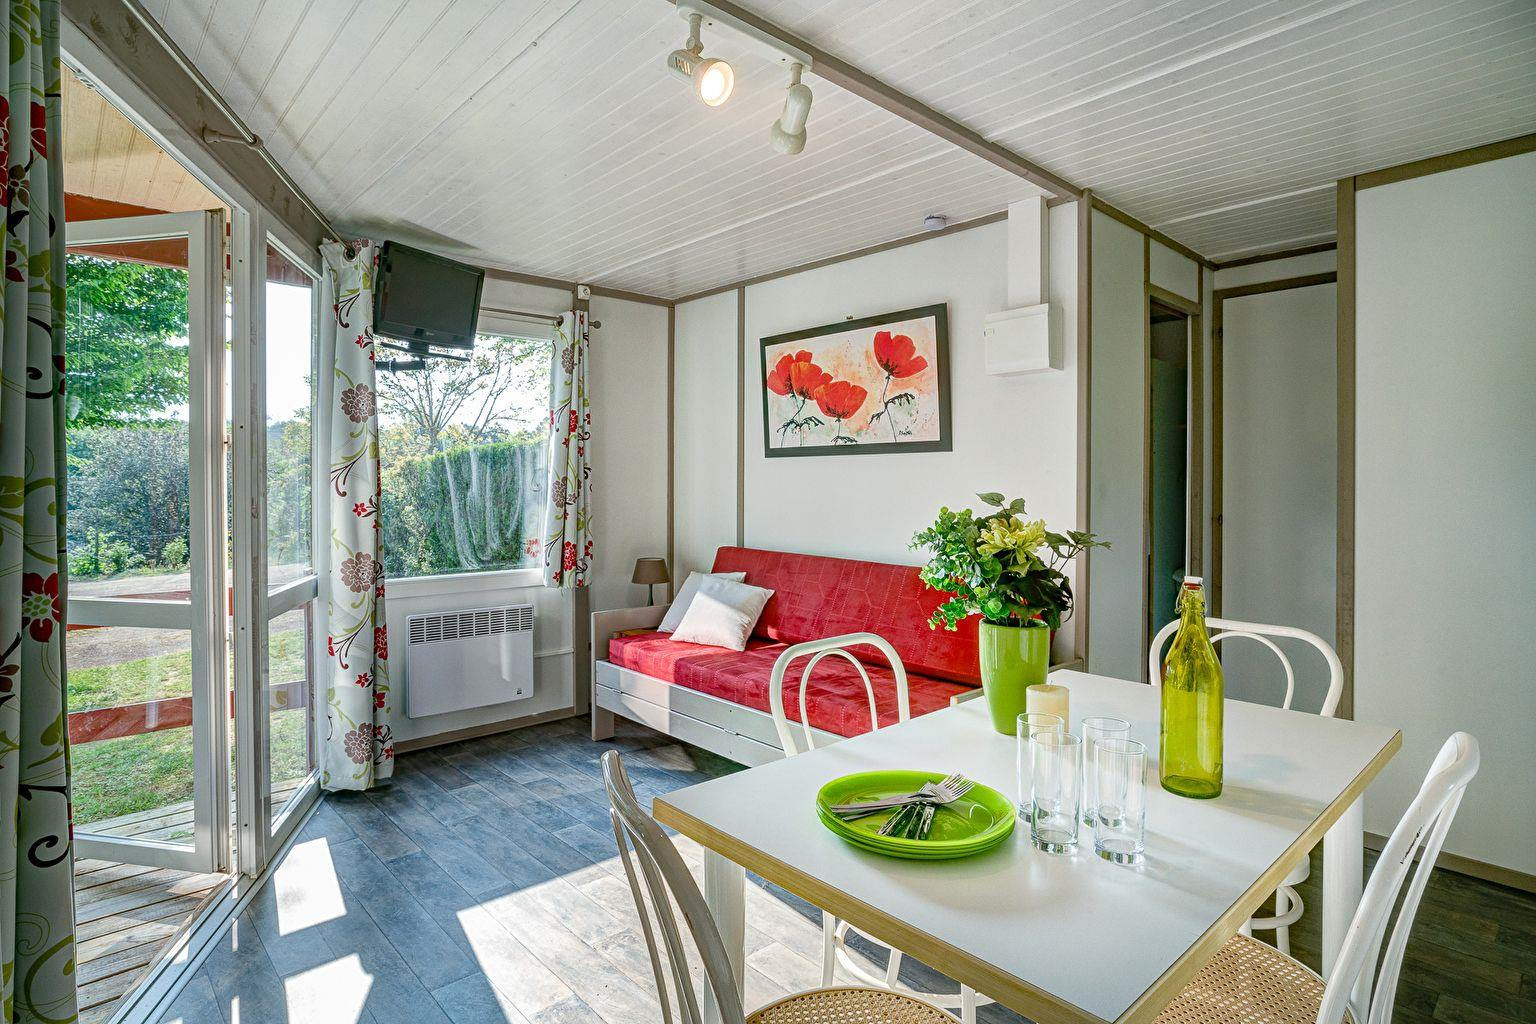 Location - Chalet Beynac 2 Chambres *** - Camping Sandaya Les Péneyrals